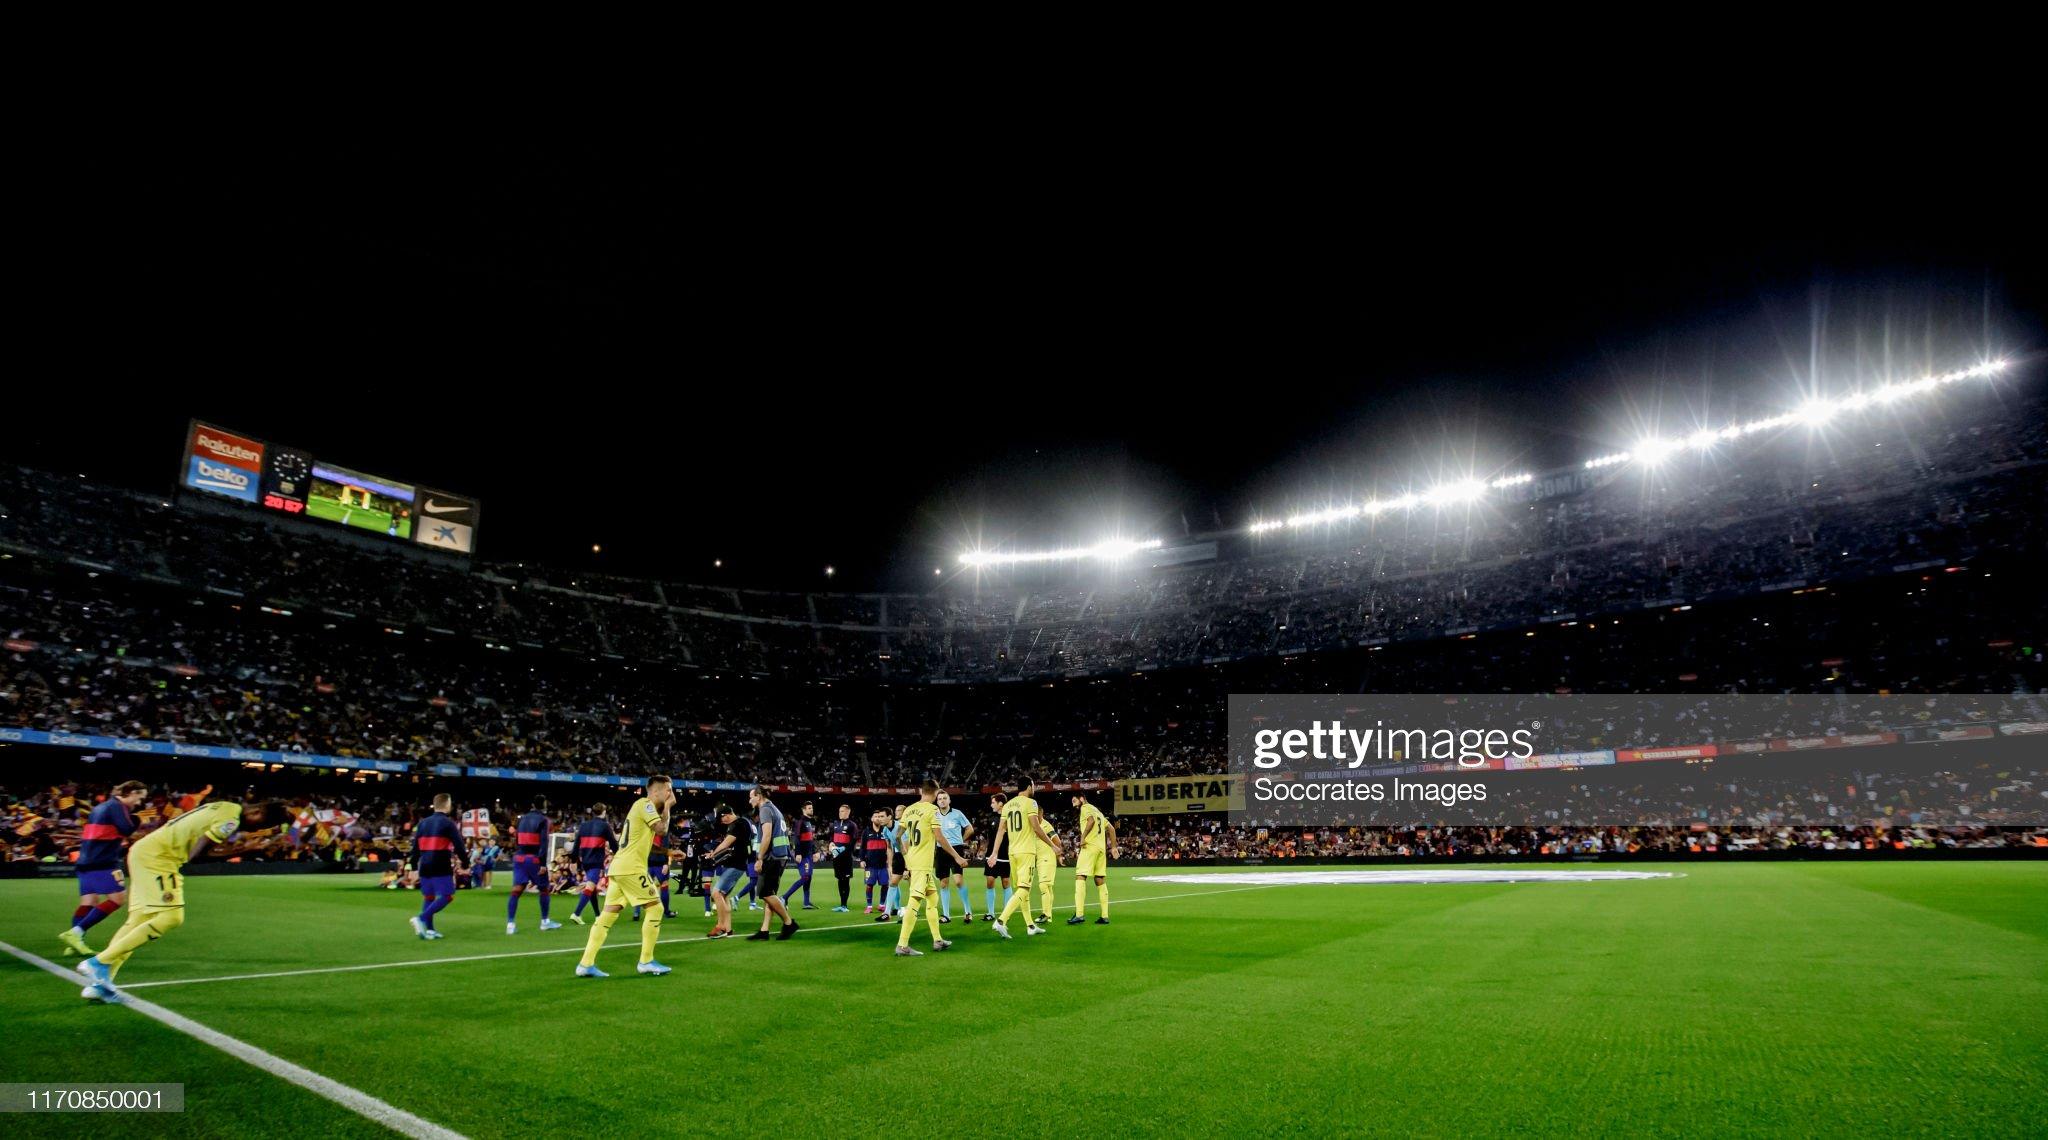 صور مباراة : برشلونة - فياريال 2-1 ( 24-09-2019 )  Line-up-of-fc-barcelona-and-villarreal-during-the-la-liga-santander-picture-id1170850001?s=2048x2048